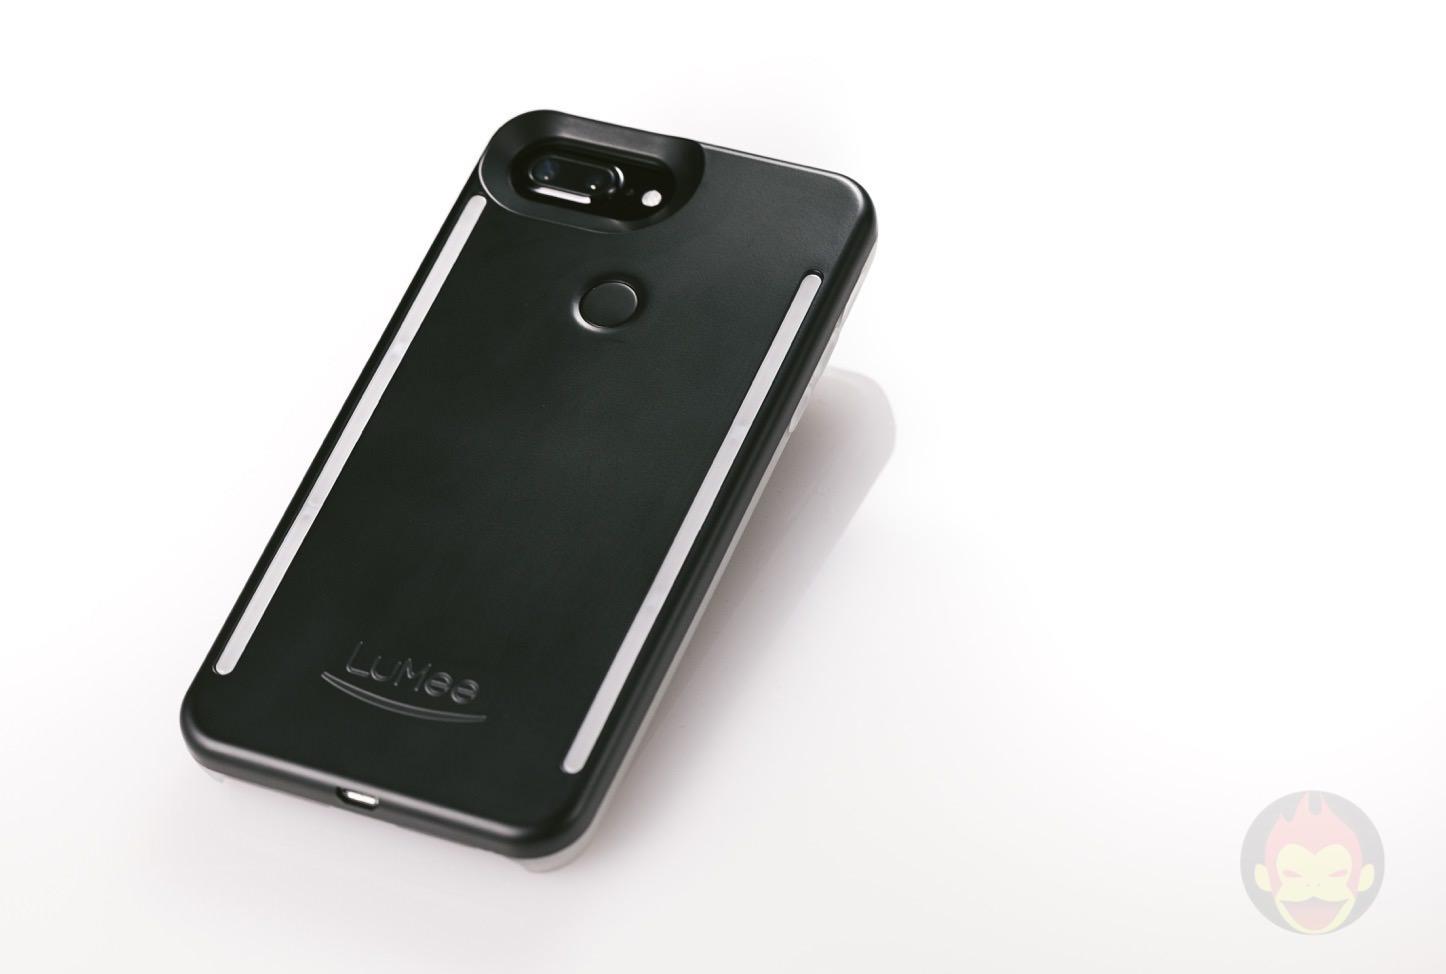 LuMee-Duo-LED-Lighting-Case-02.jpg